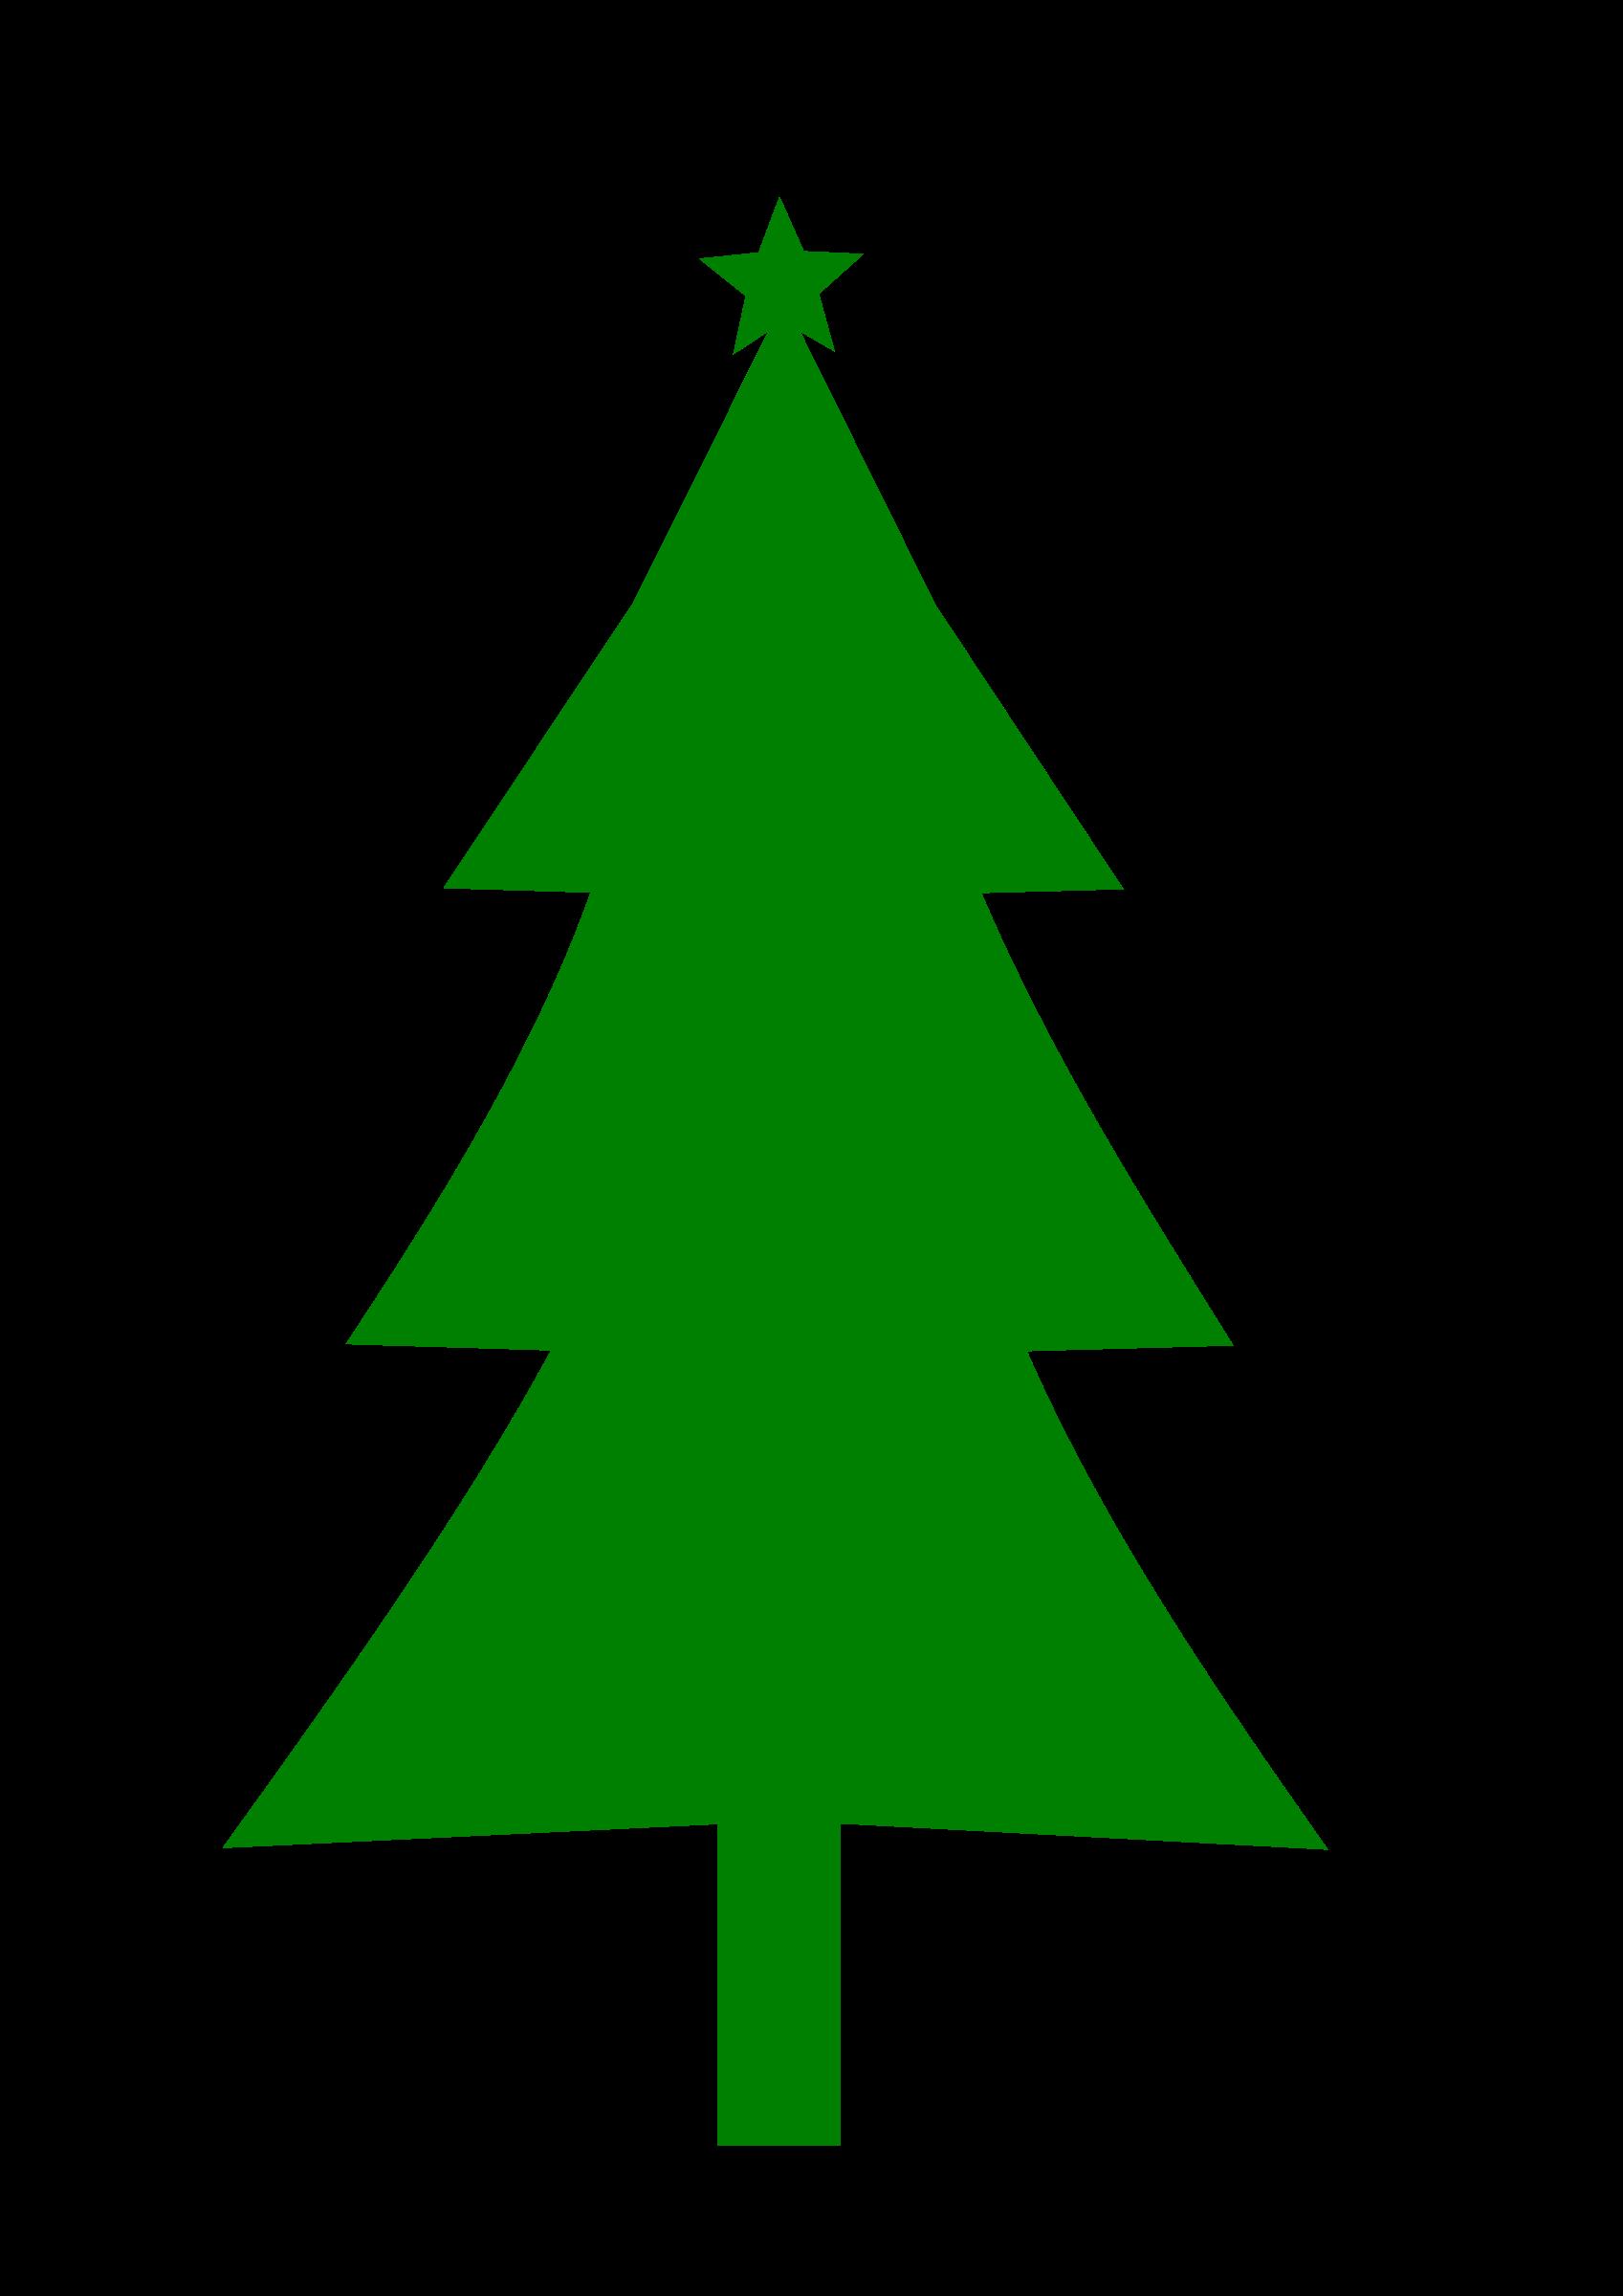 Christmas Music Clipart.Music Clipart Christmas Music Christmas Transparent Free